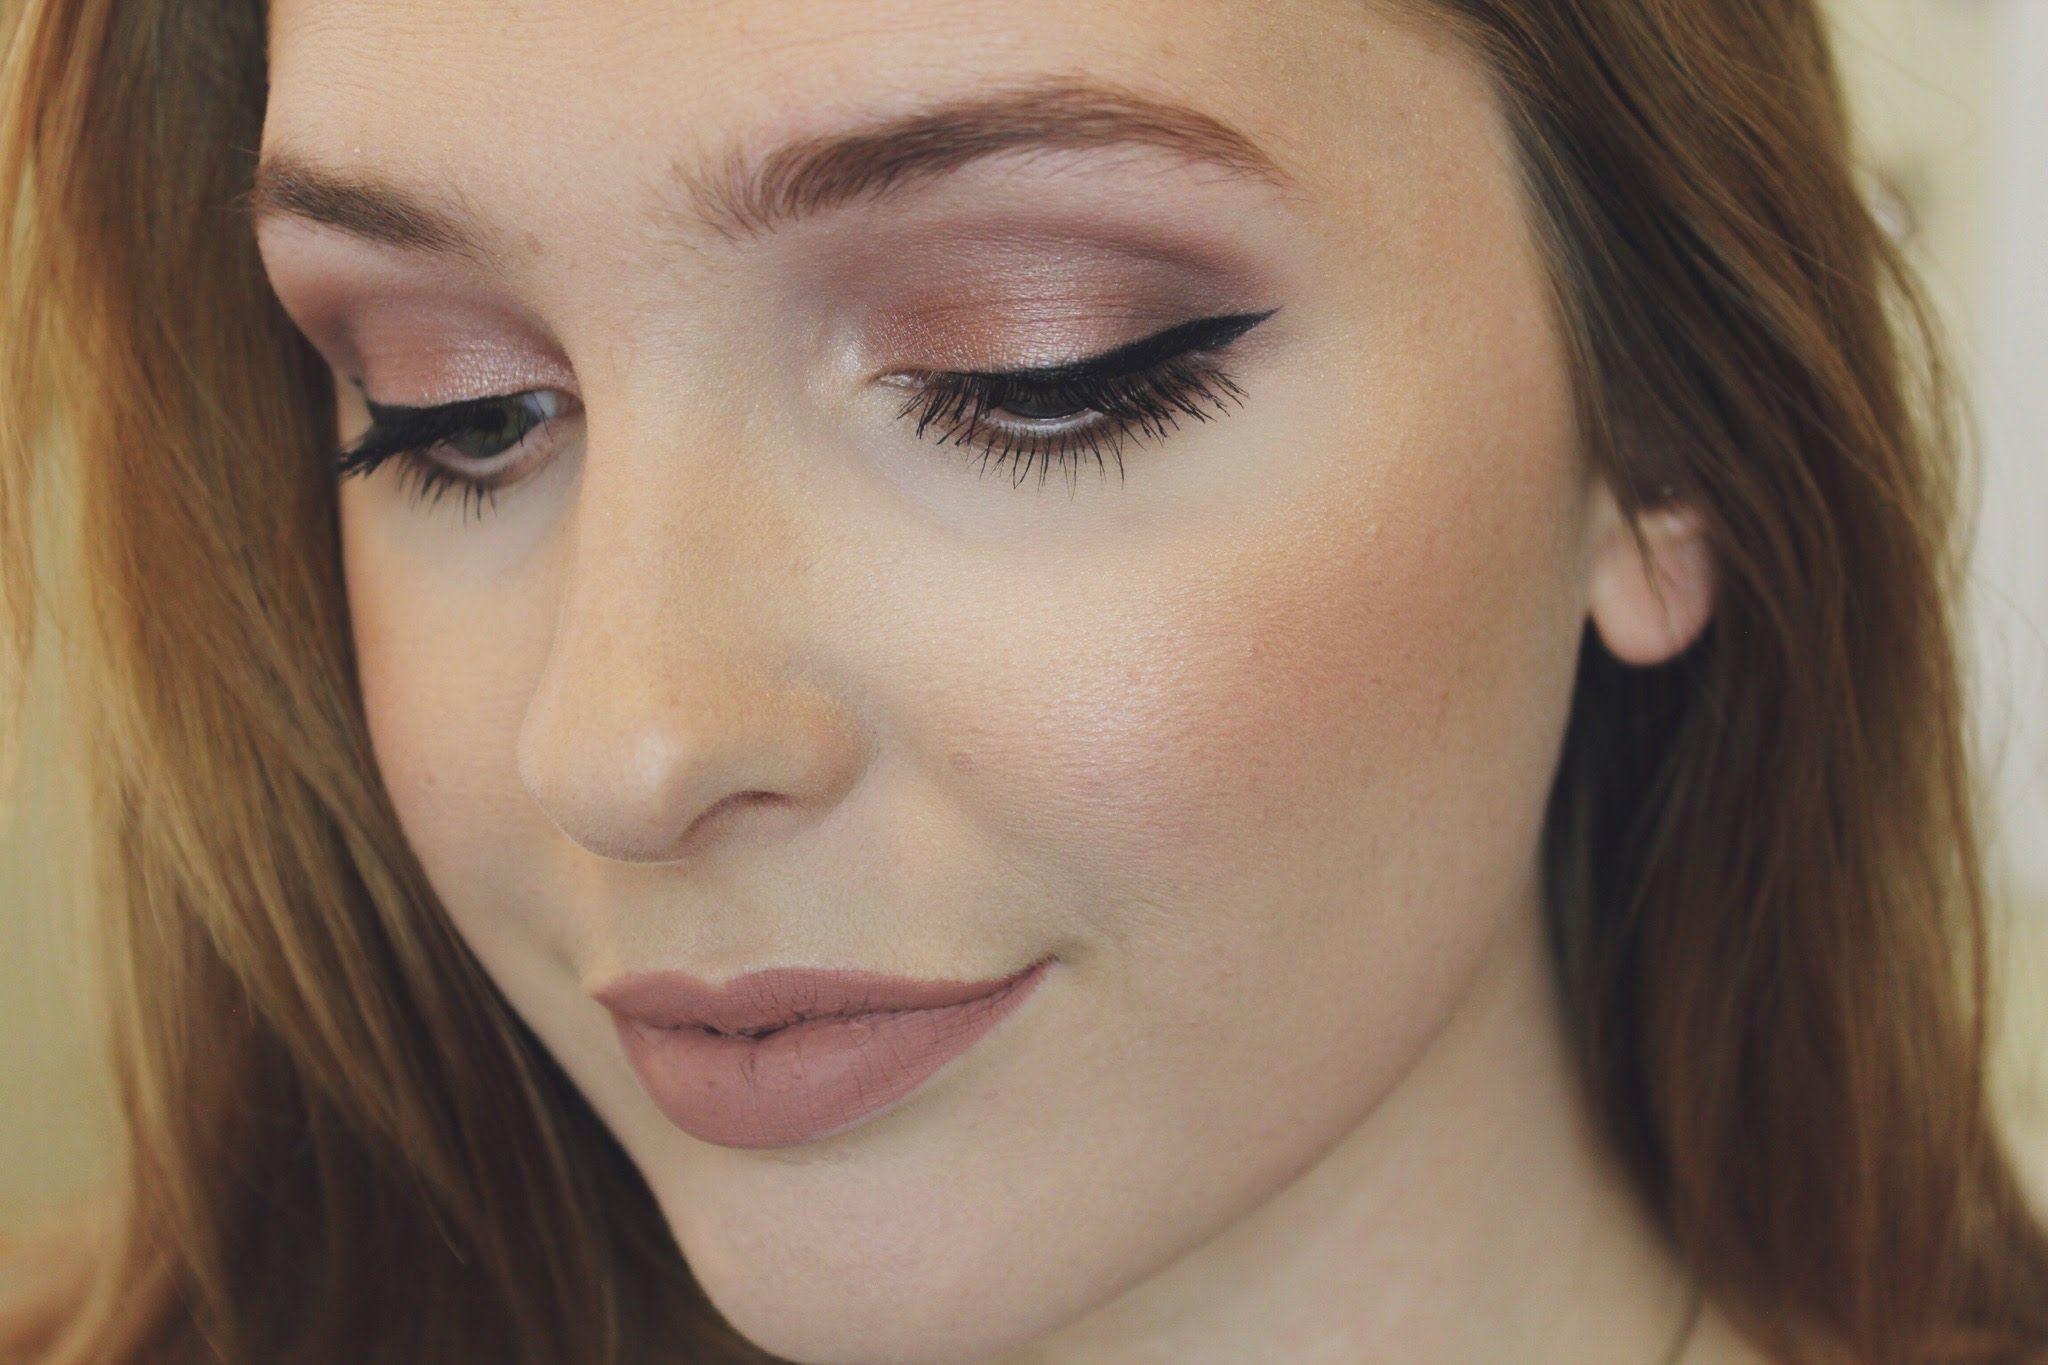 Soft and romantic makeup tutorial morphe 35t b e a u t y soft and romantic makeup tutorial morphe 35t baditri Gallery